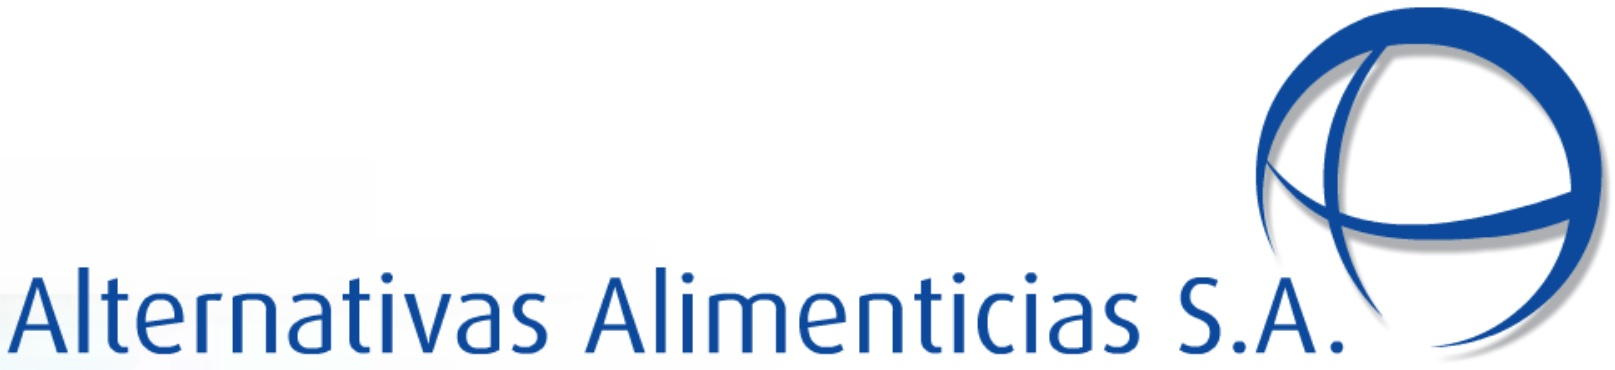 Alternativas Alimenticias.jpg